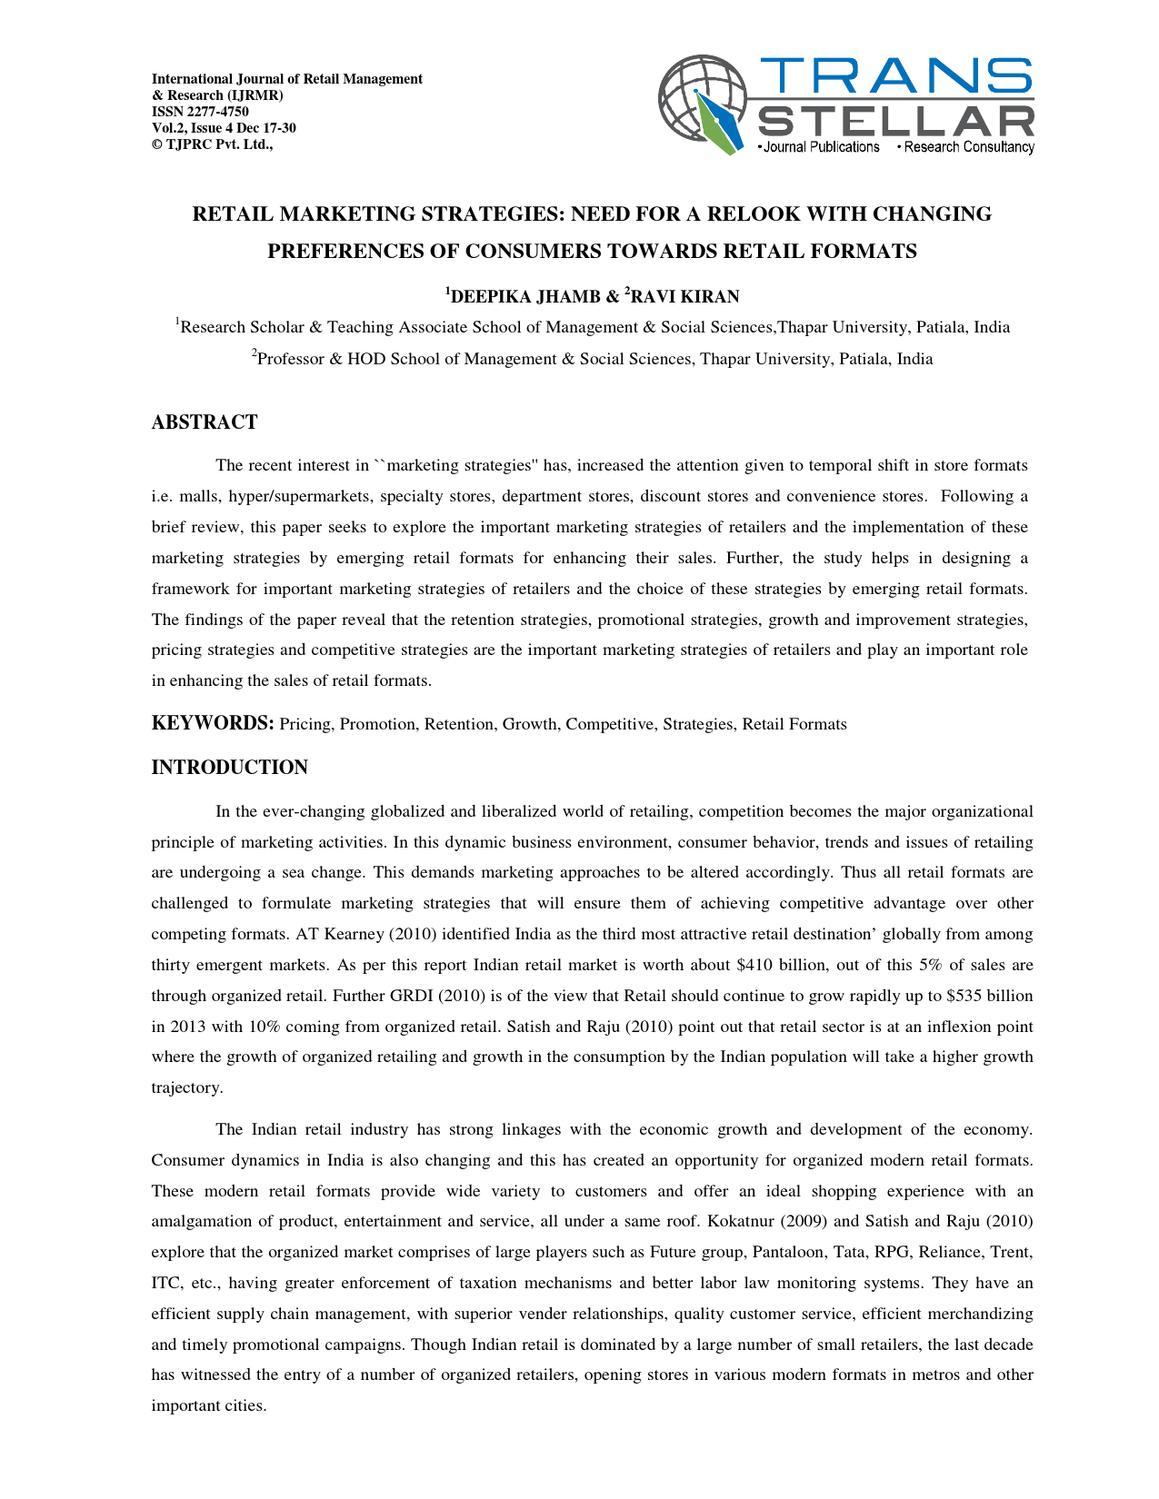 2 RMR Retail FULL by Transtellar Publications - issuu